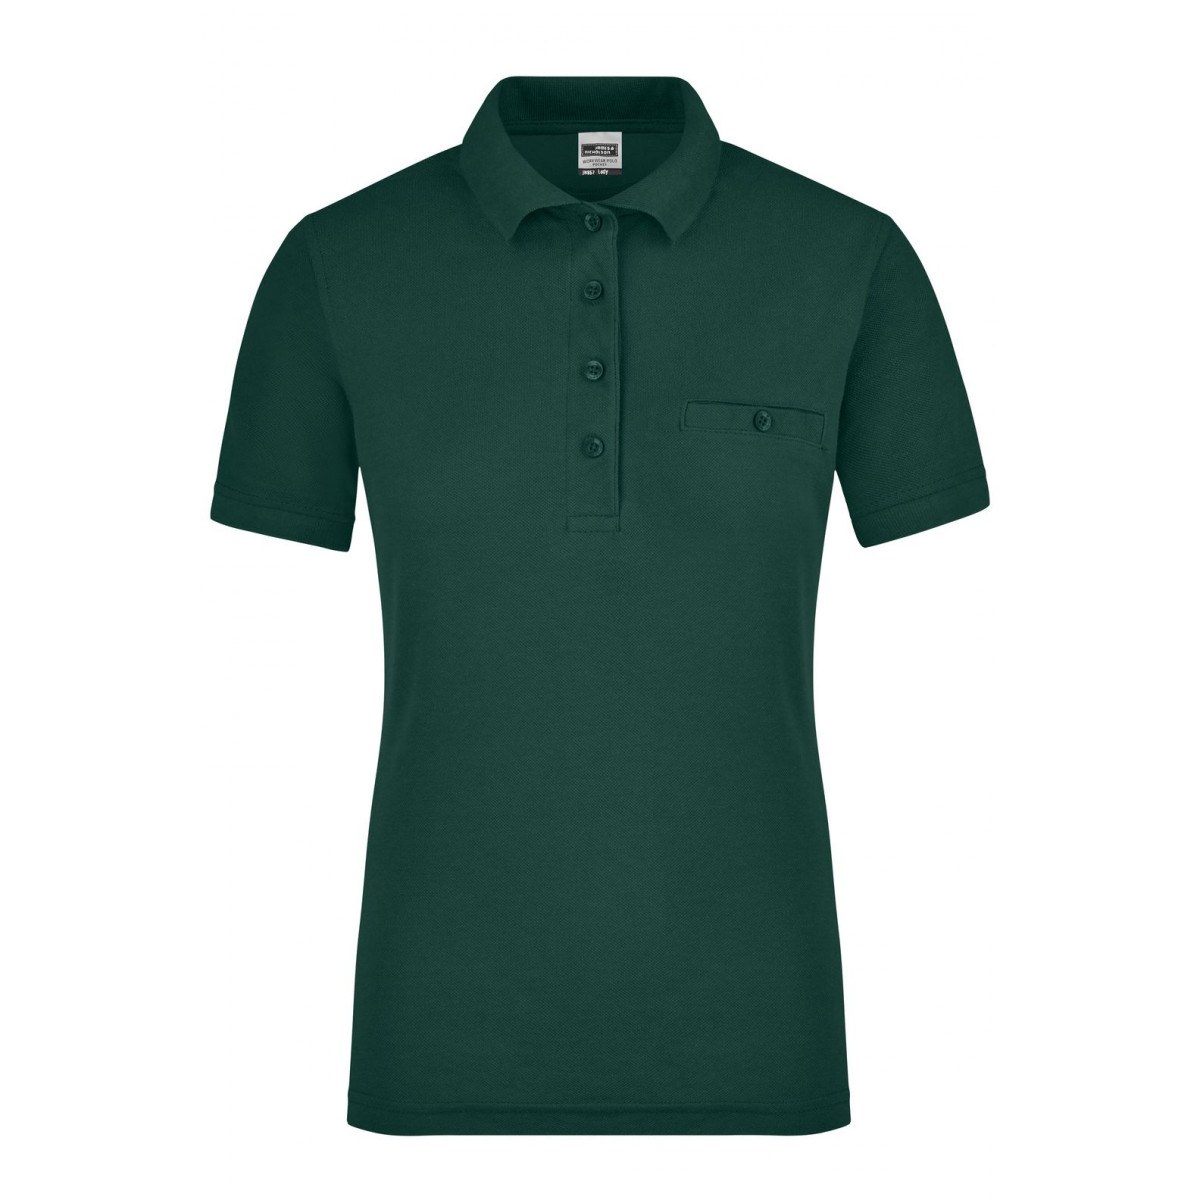 Рубашка поло женская JN867 Ladies Workwear Polo Pocket - Темно-зеленый